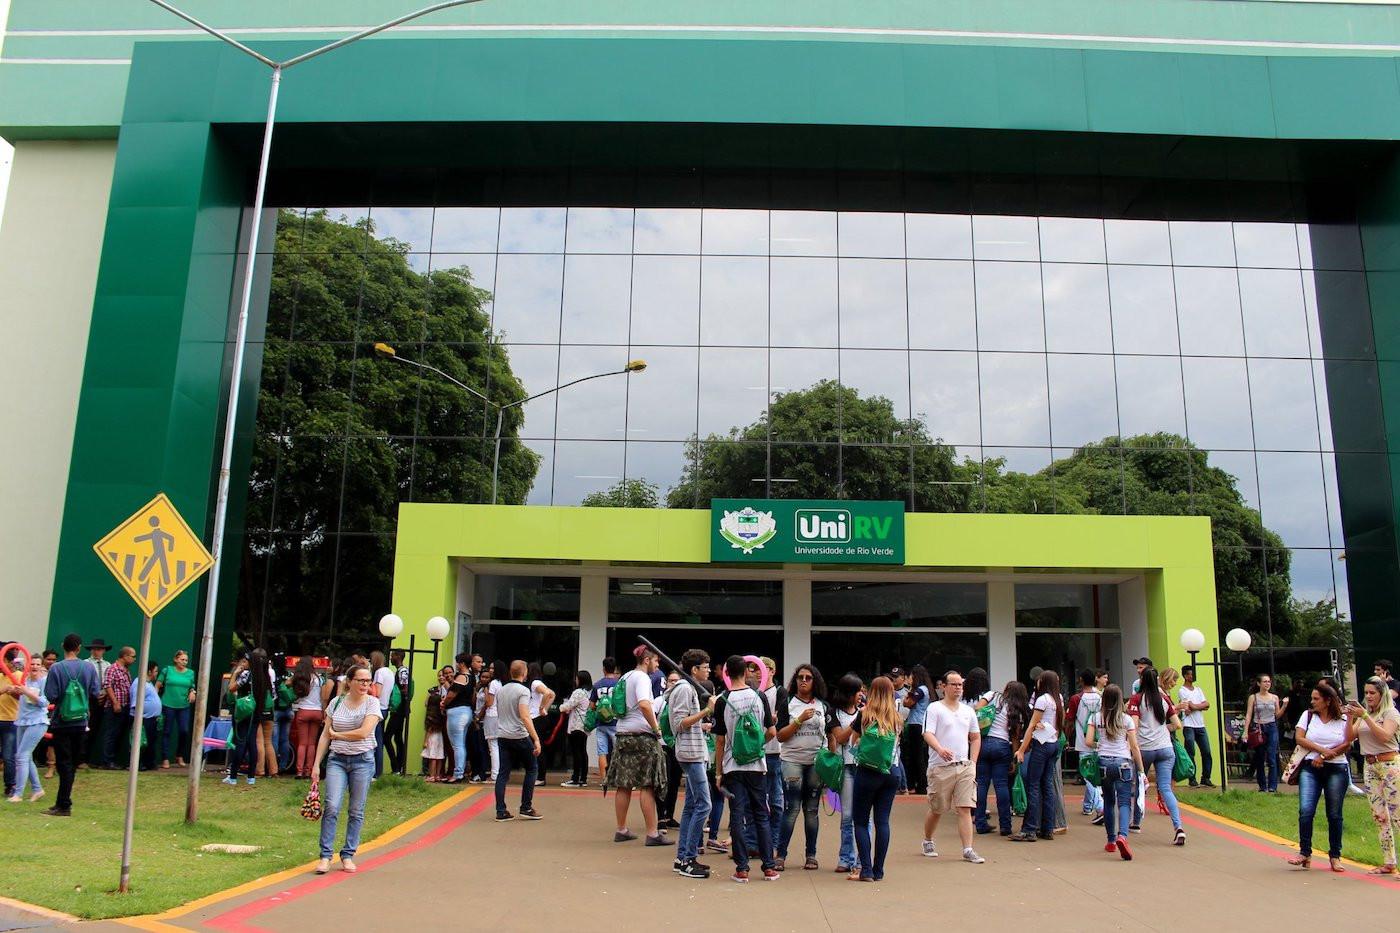 University of Rio Verde rector Alberto Barella was pleased to join a